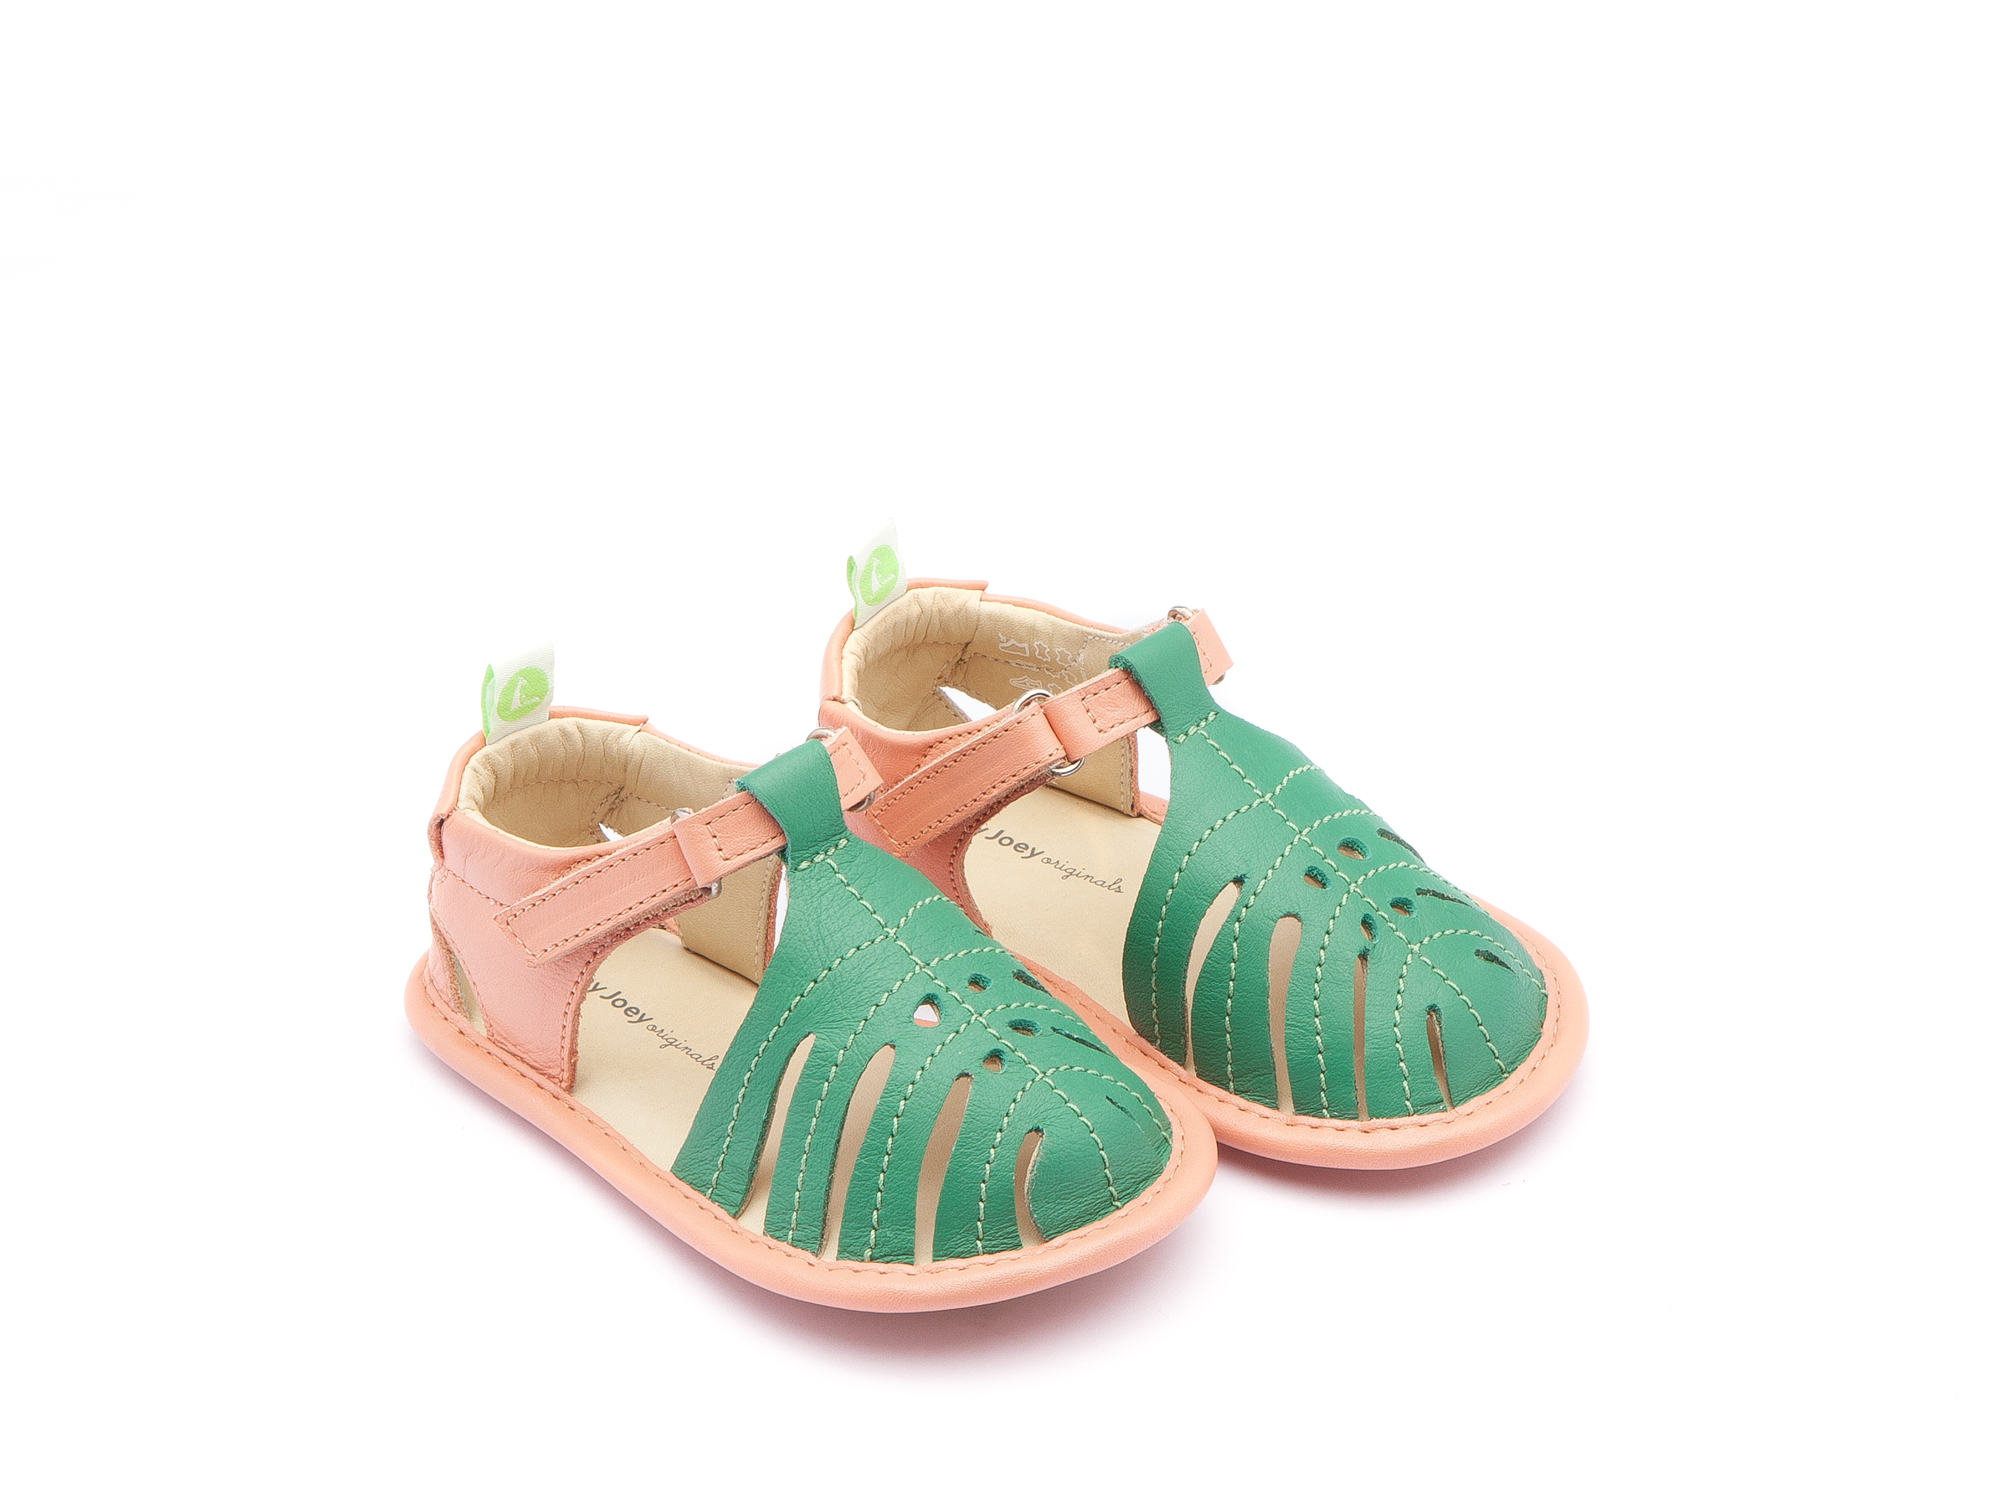 sandalia Bebê feminino tropically